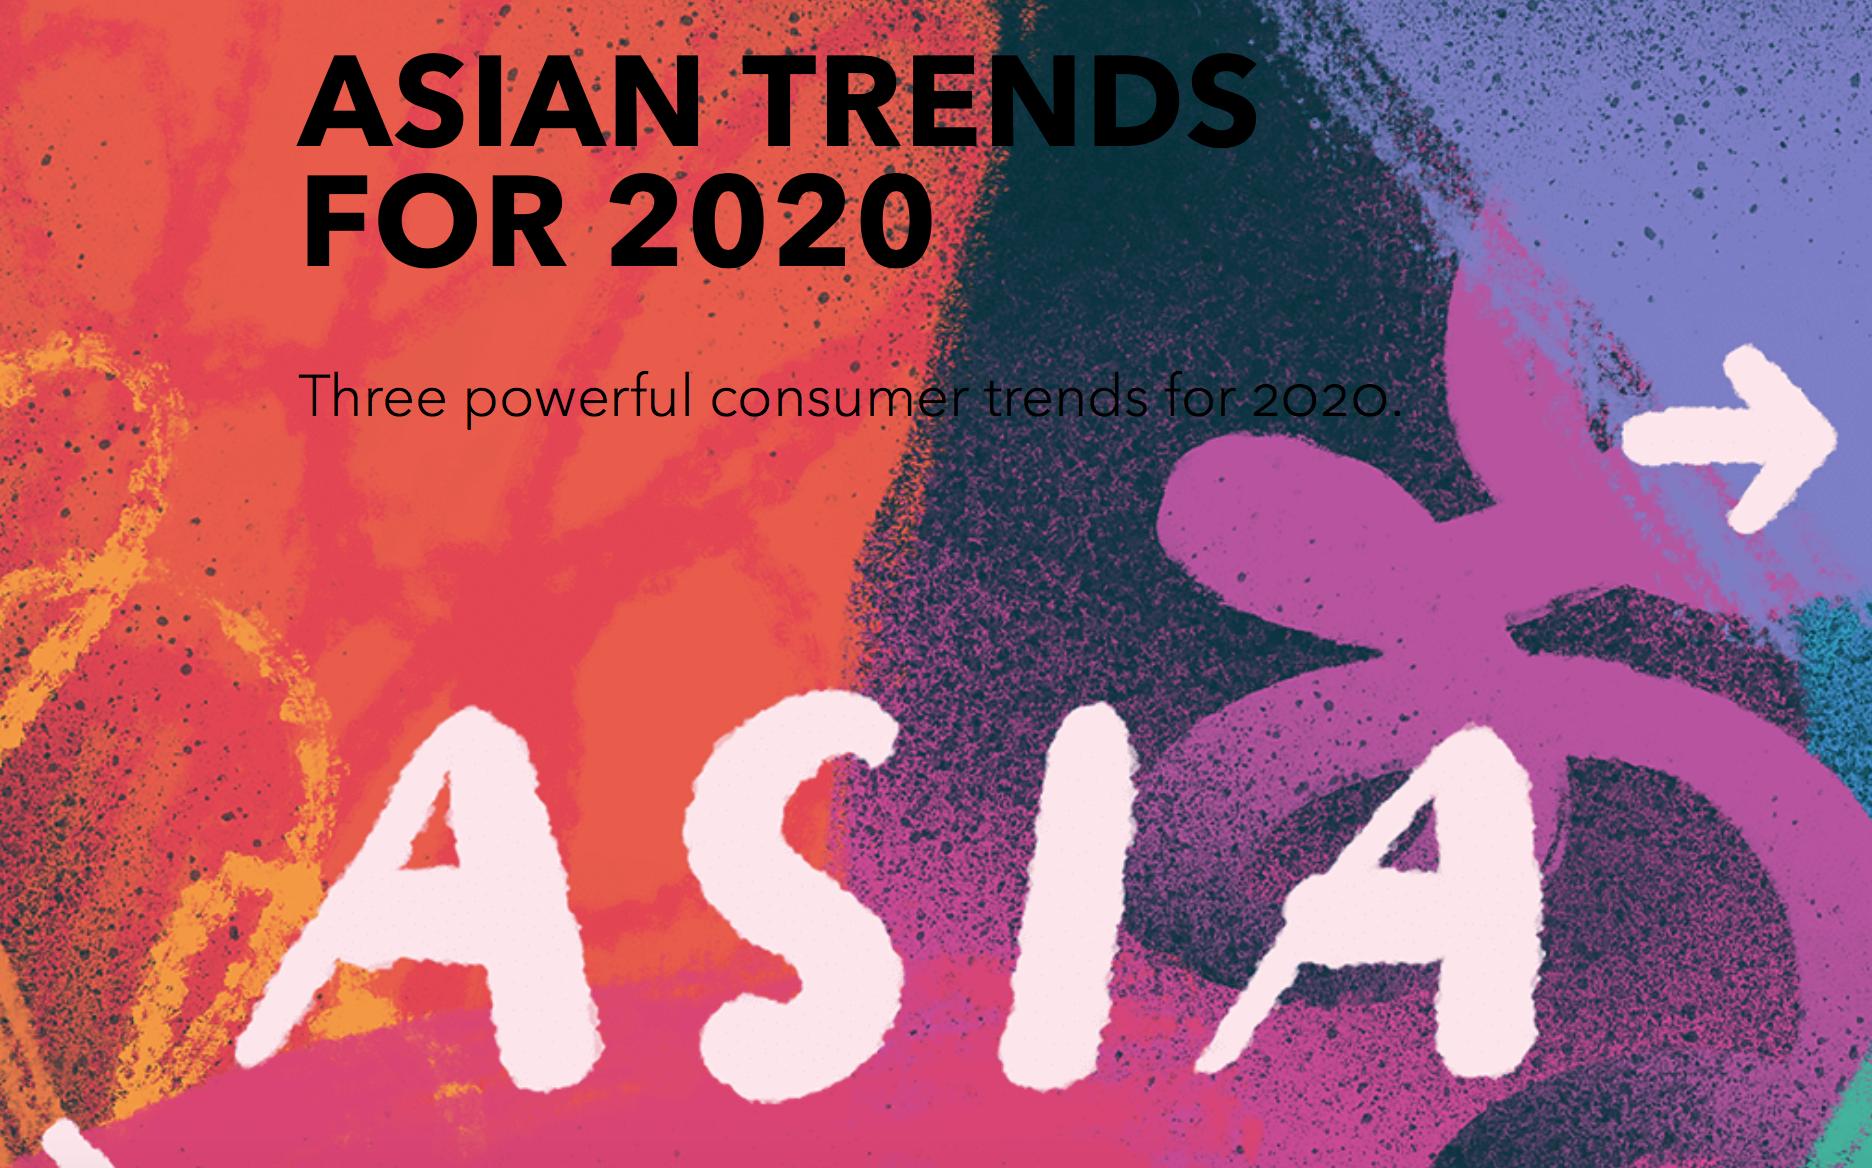 Asian Consumer Trends